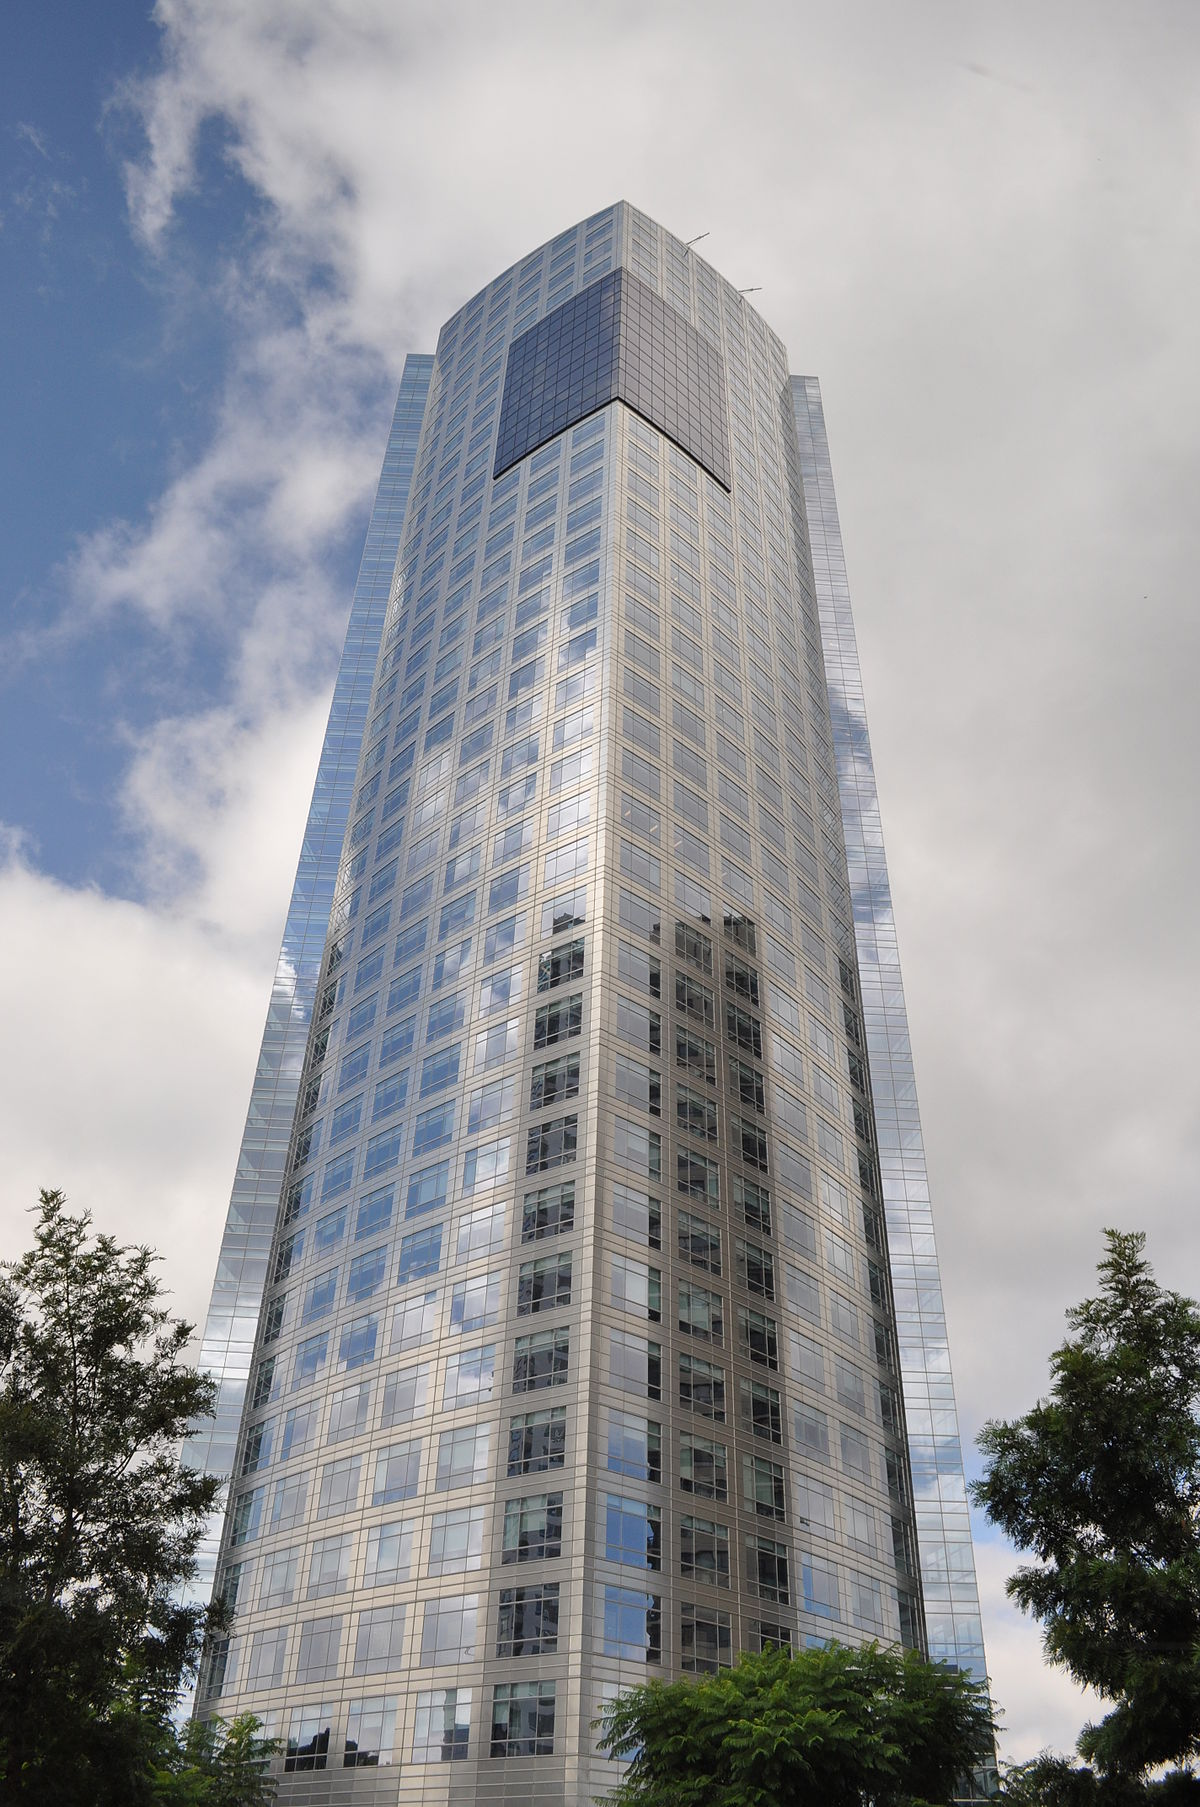 Repsol Ypf Tower Wikipedia